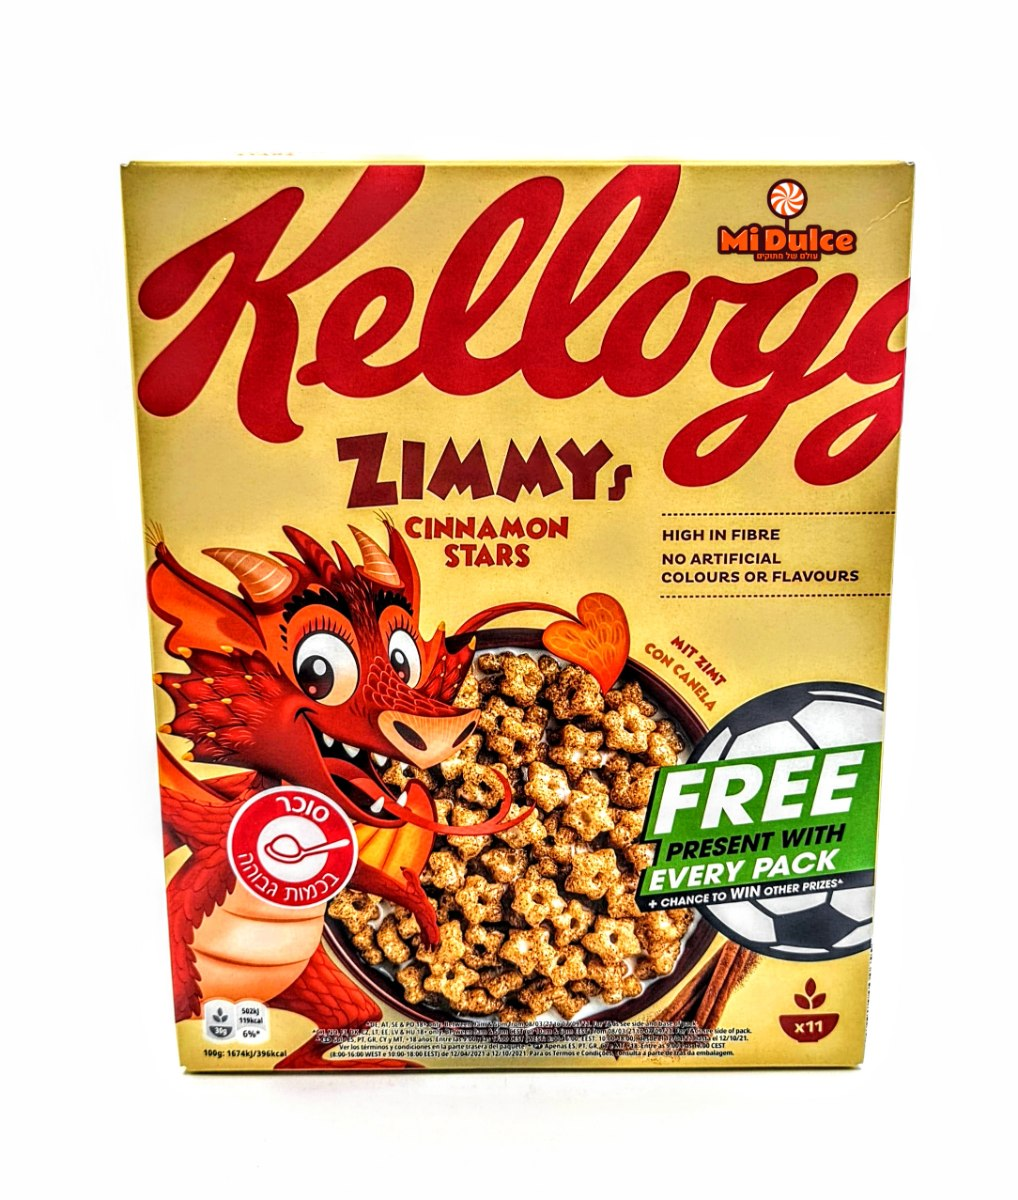 Zimmy's Cinnamon Stars